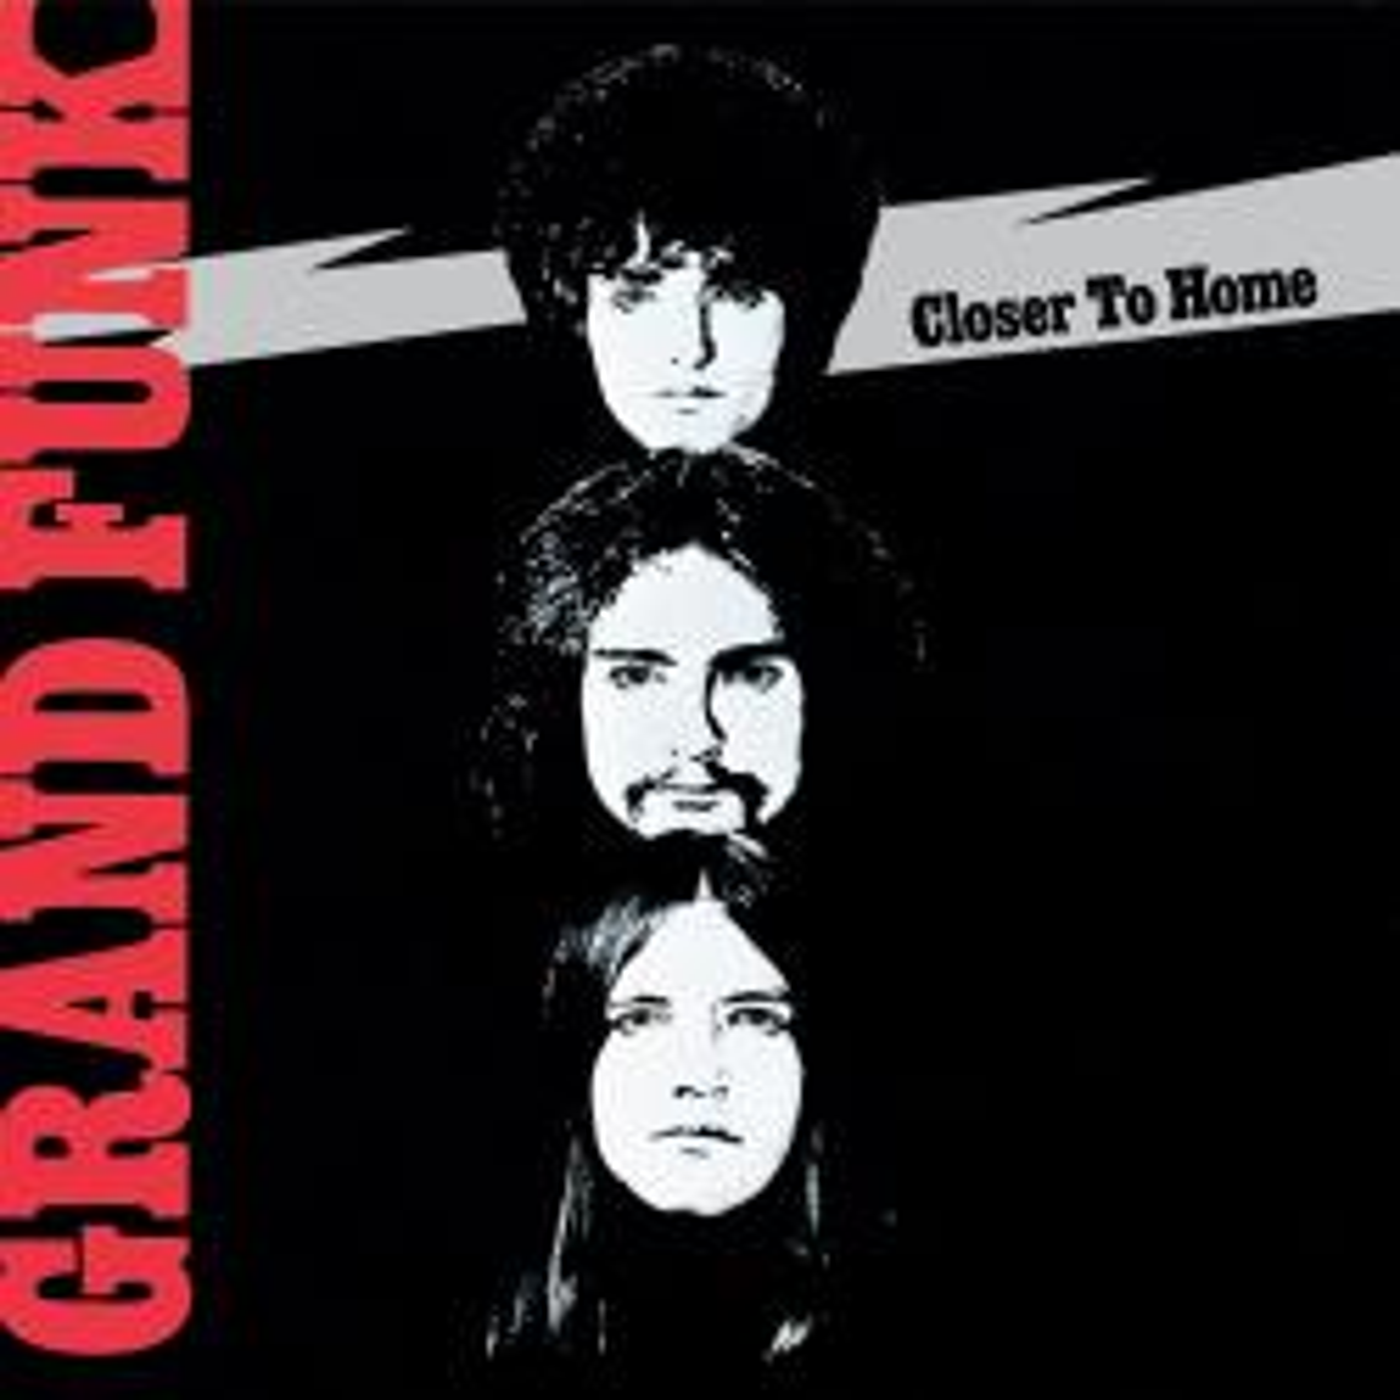 Виниловая пластинка Closer to Home - Grand Funk Railroad